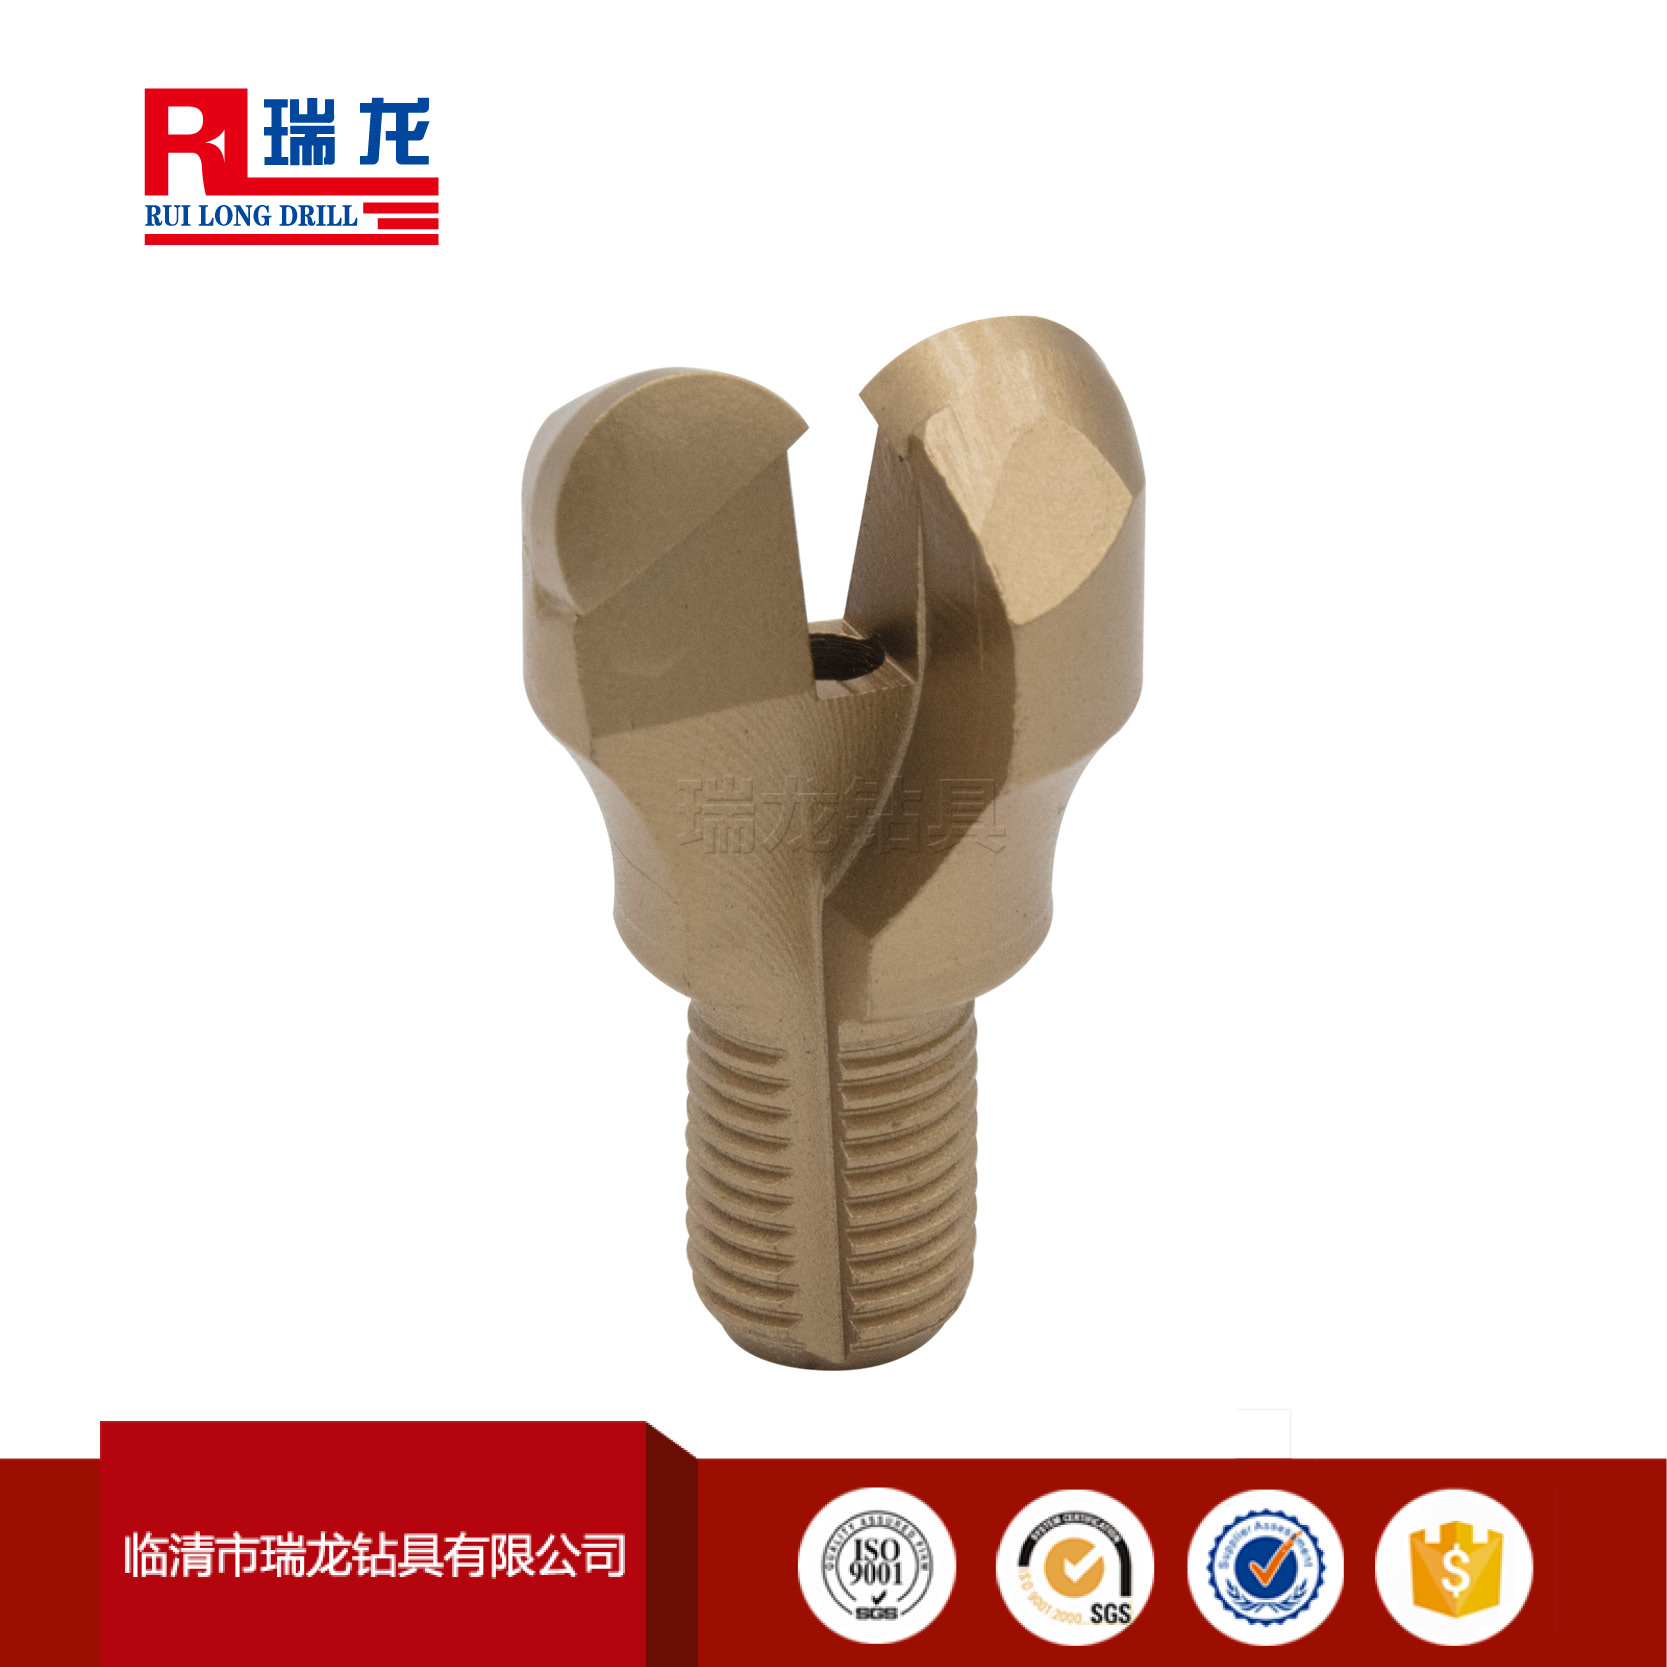 φ28-M14*1.5金刚石锚杆钻头瑞龙钻具(半片)